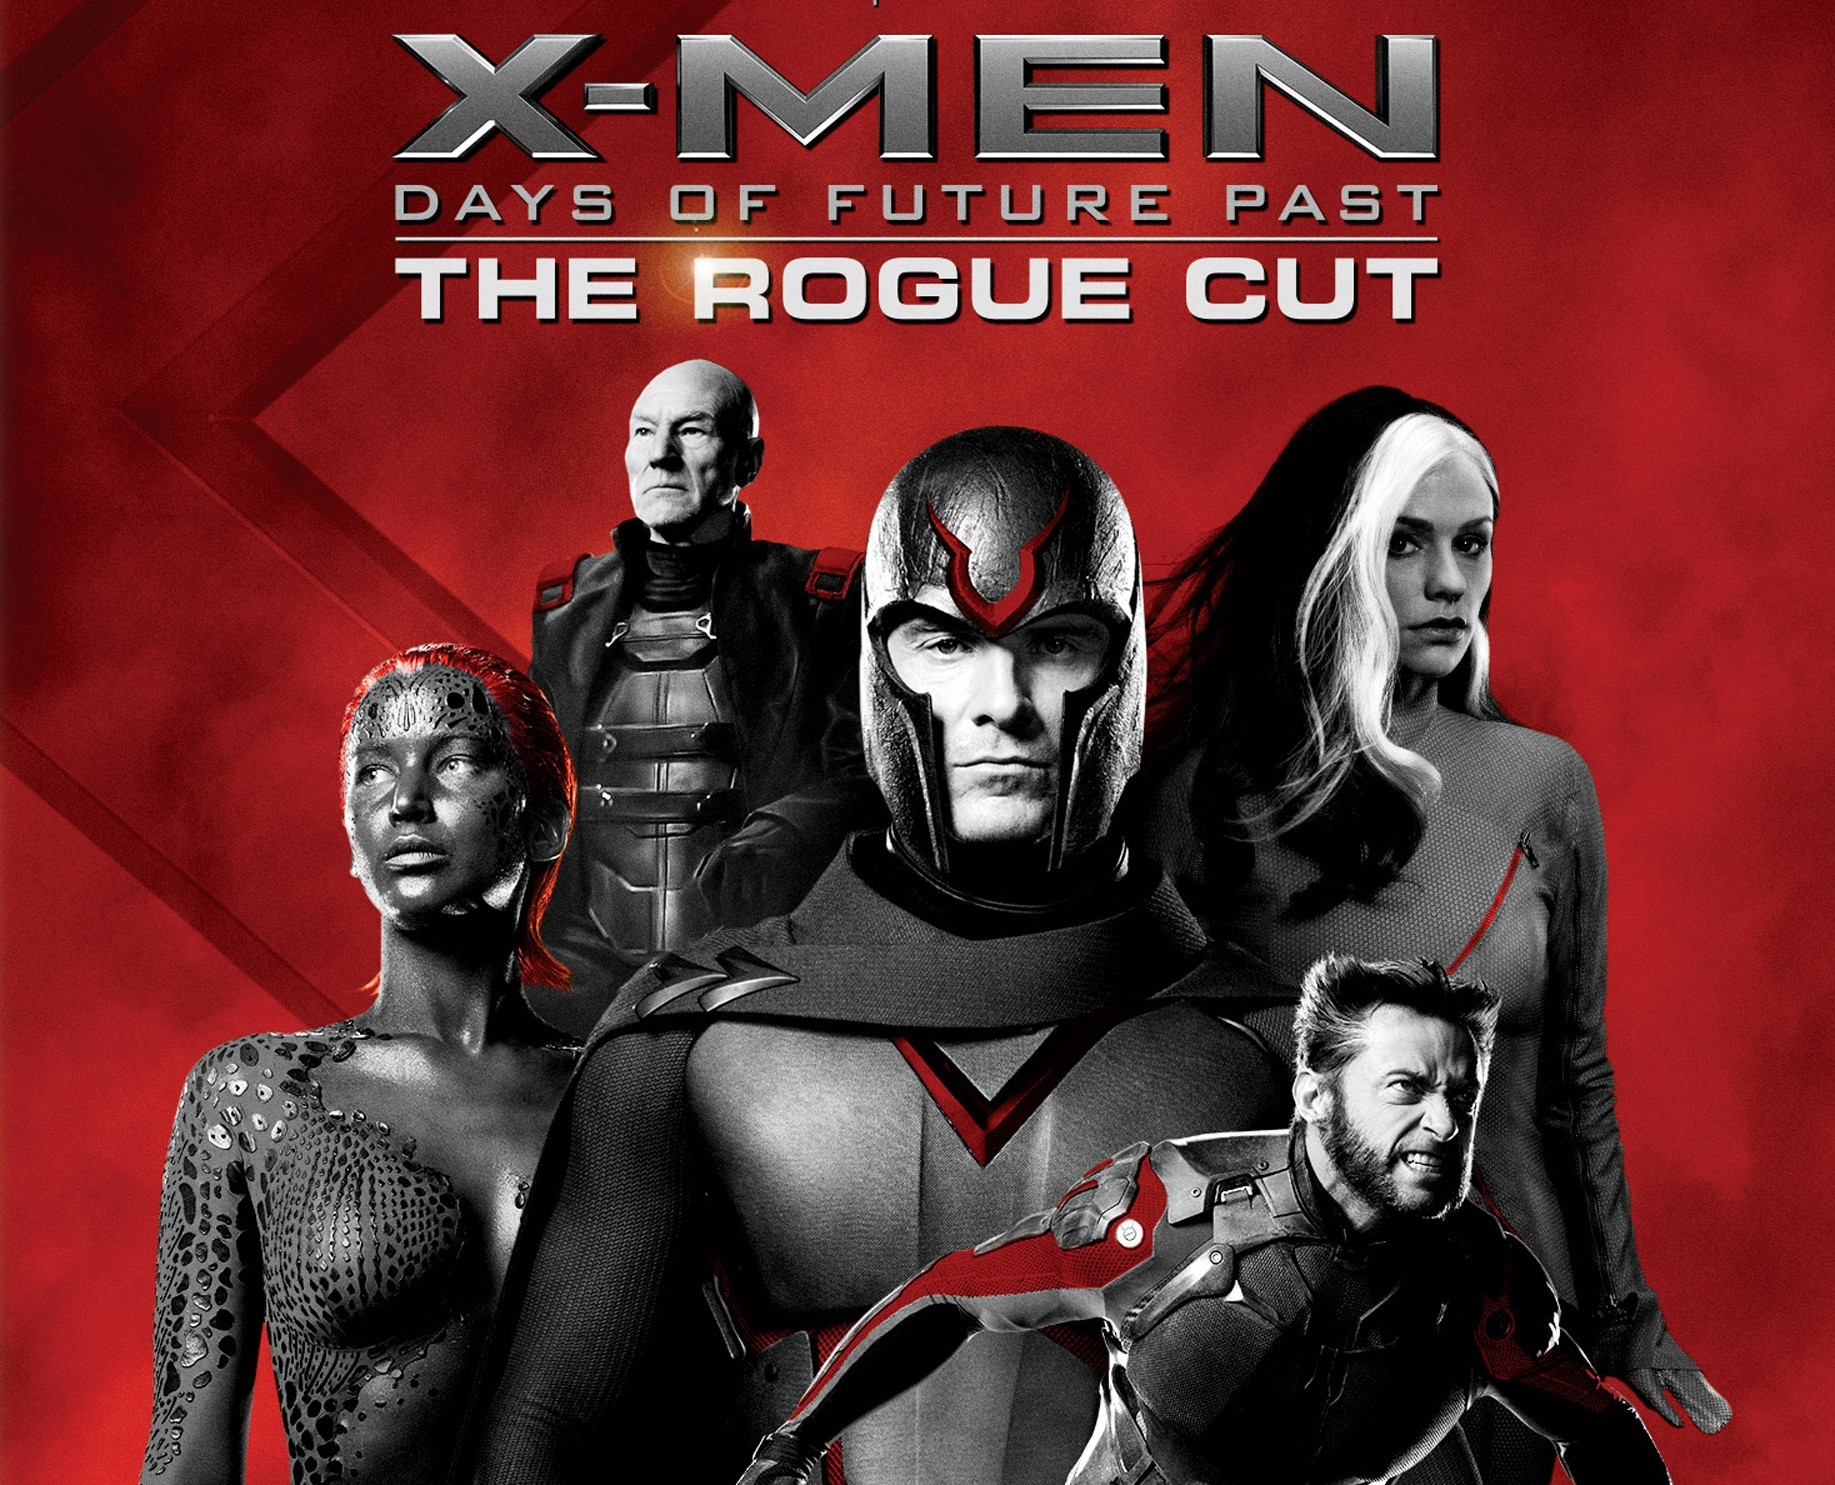 X-MEN DAYS OF FUTURE PAST: THE ROGUE CUT. (Blu-ray/DVD artwork). ©20th Century Fox.